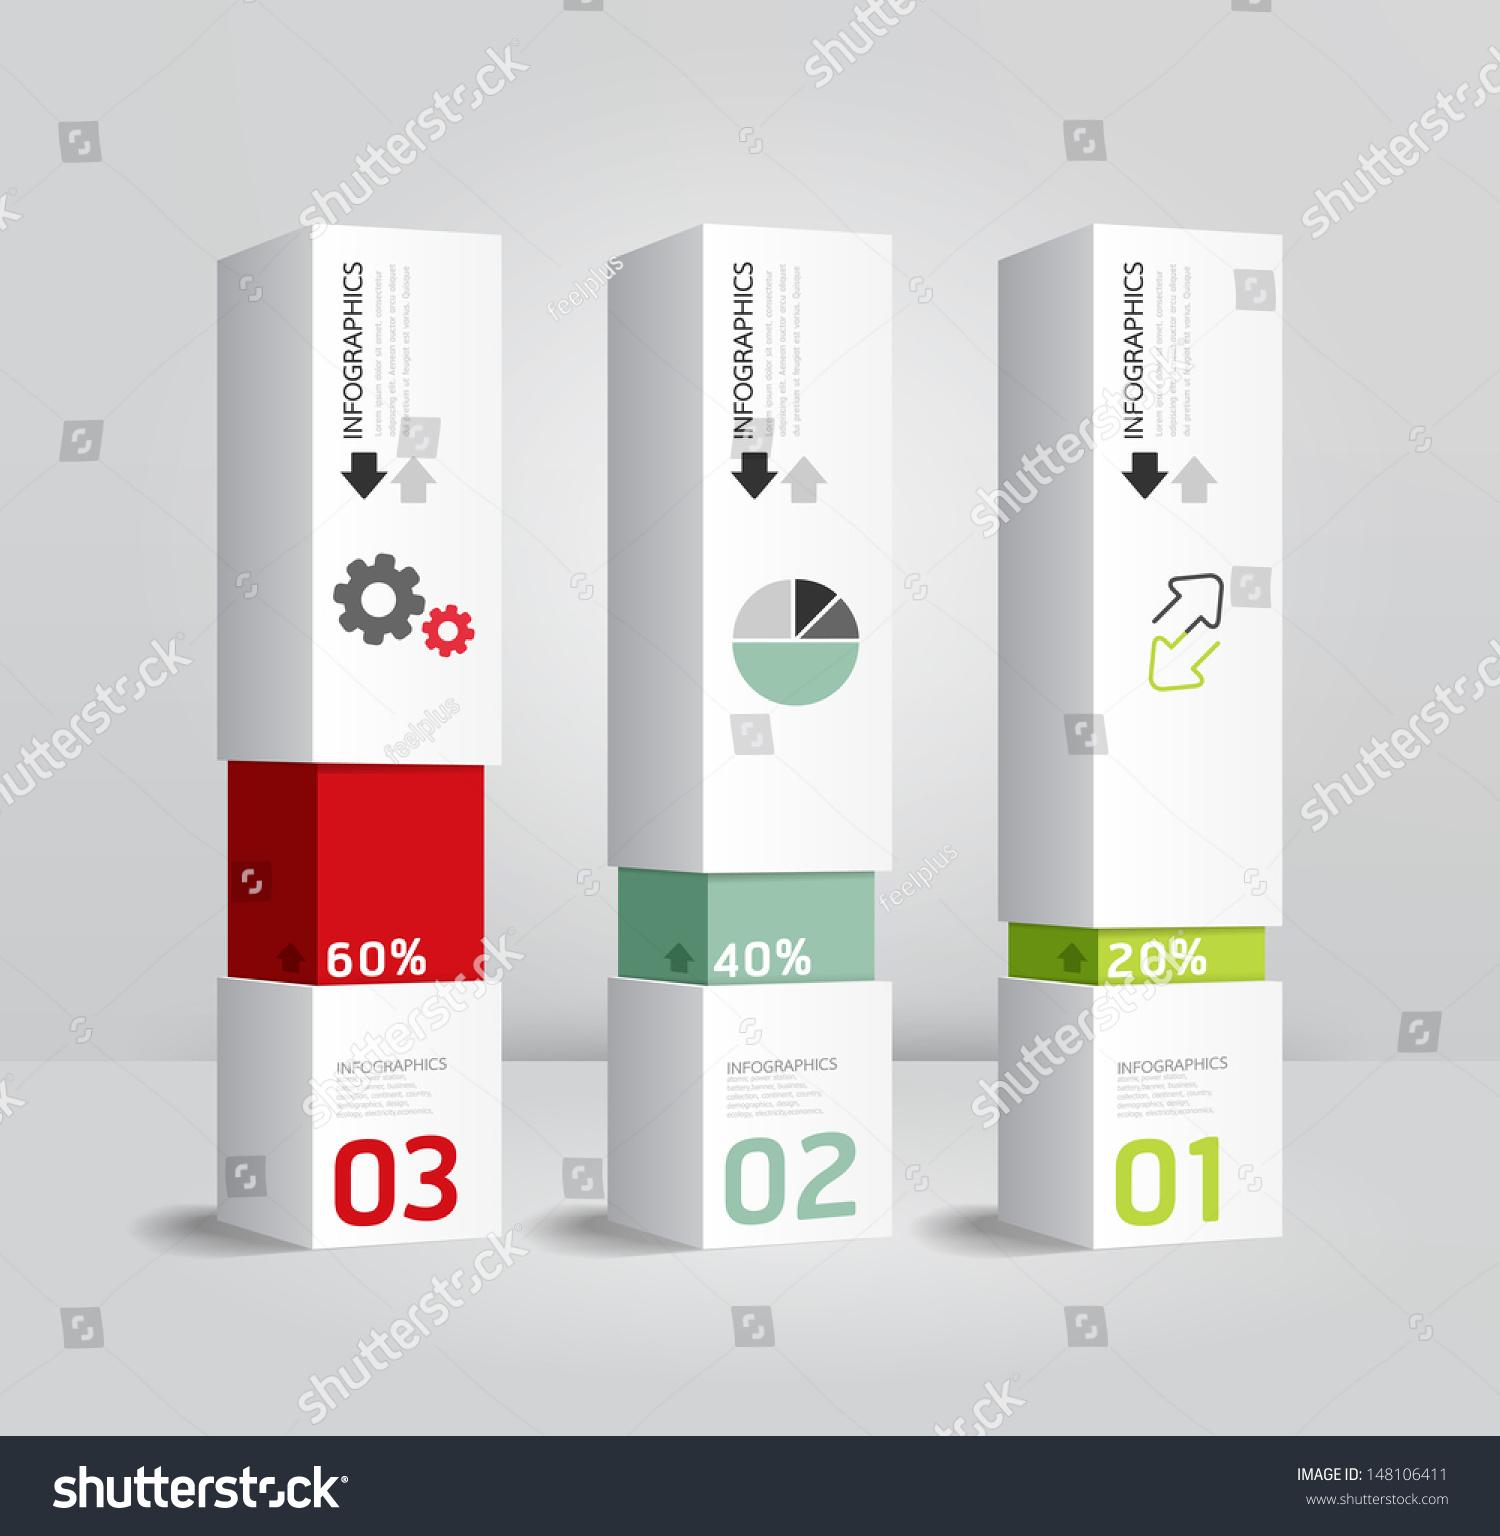 Infographic template modern box design minimal stock for Design minimal